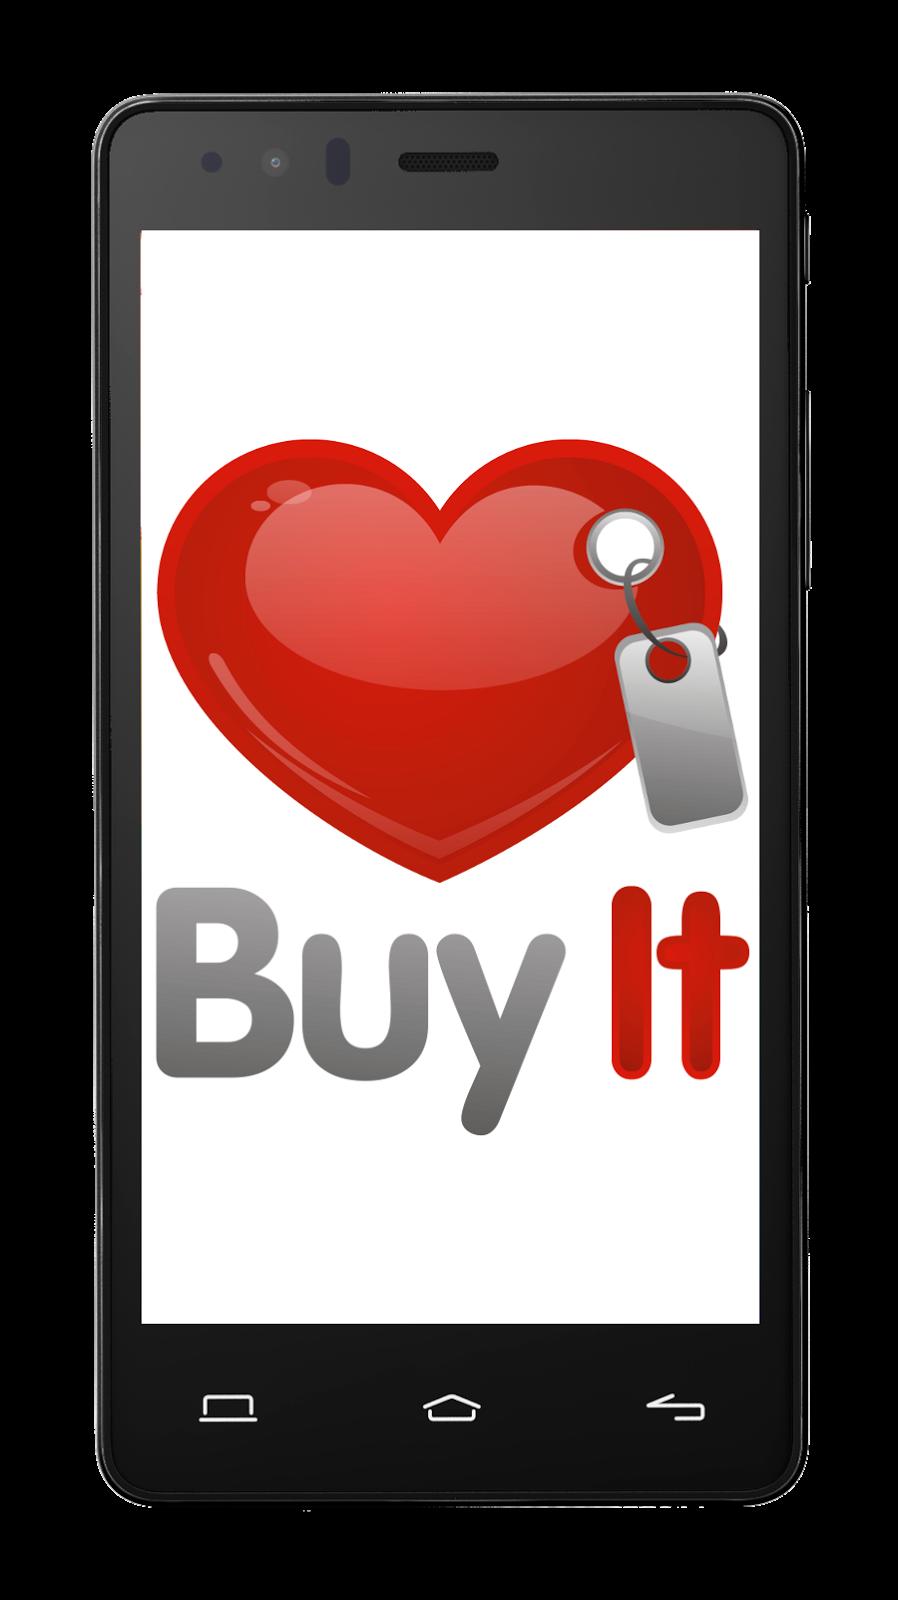 https://play.google.com/store/apps/details?id=es.buyit